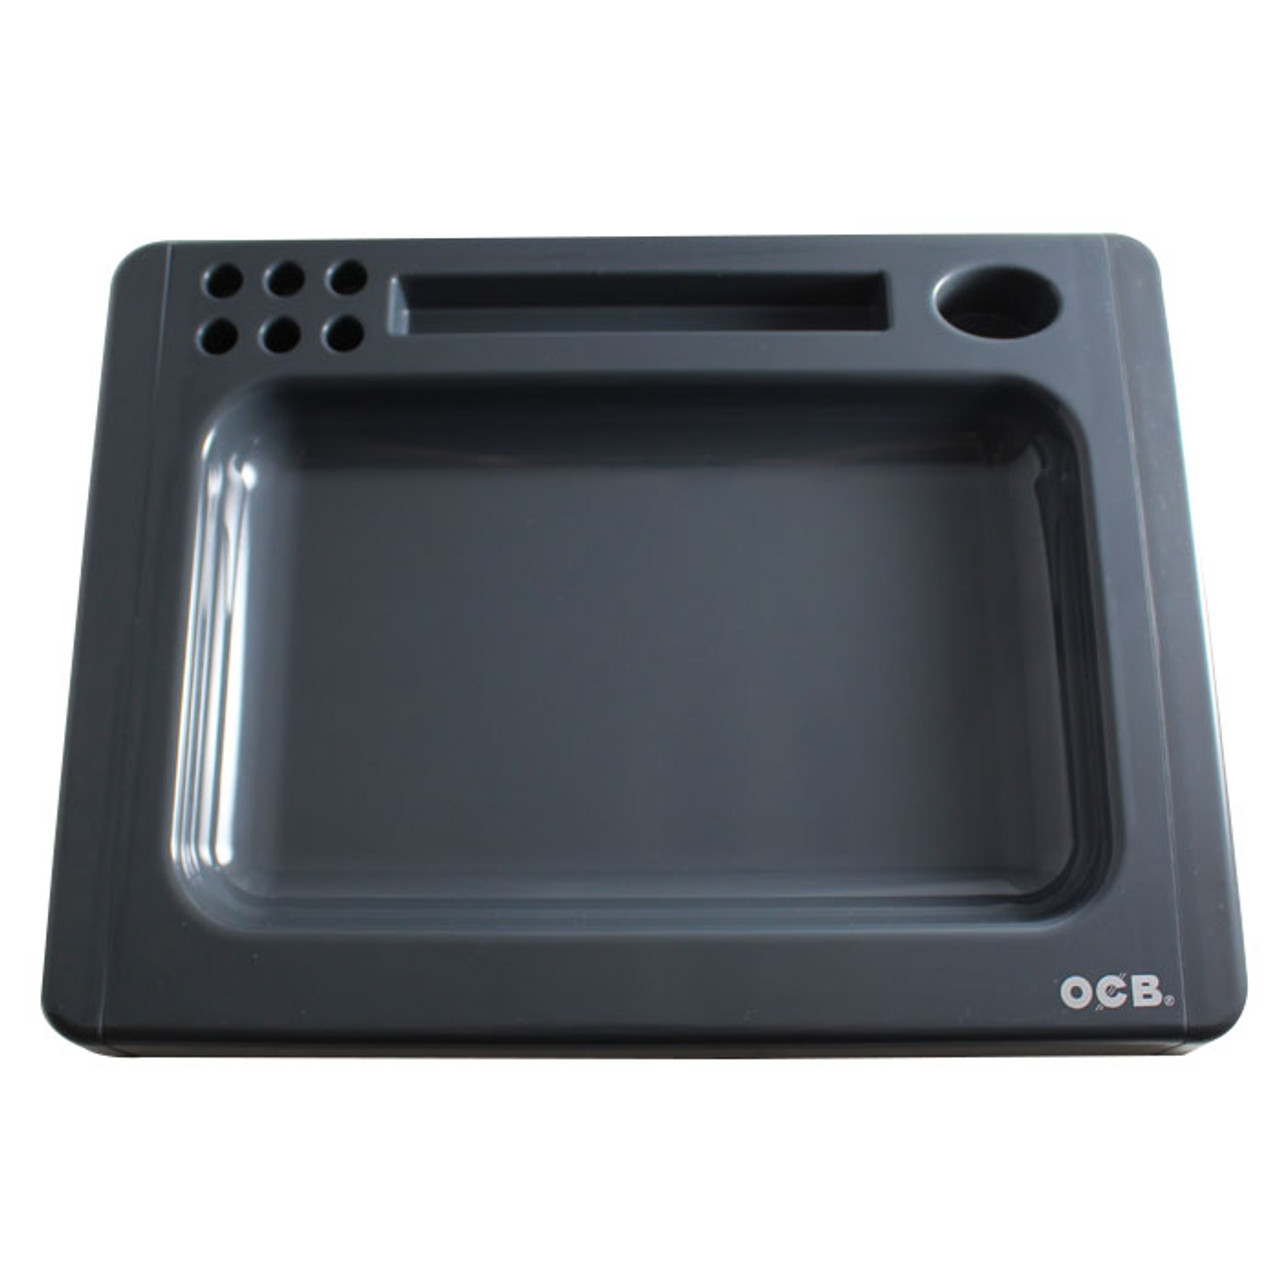 OCB - MOBO Rolling Tray